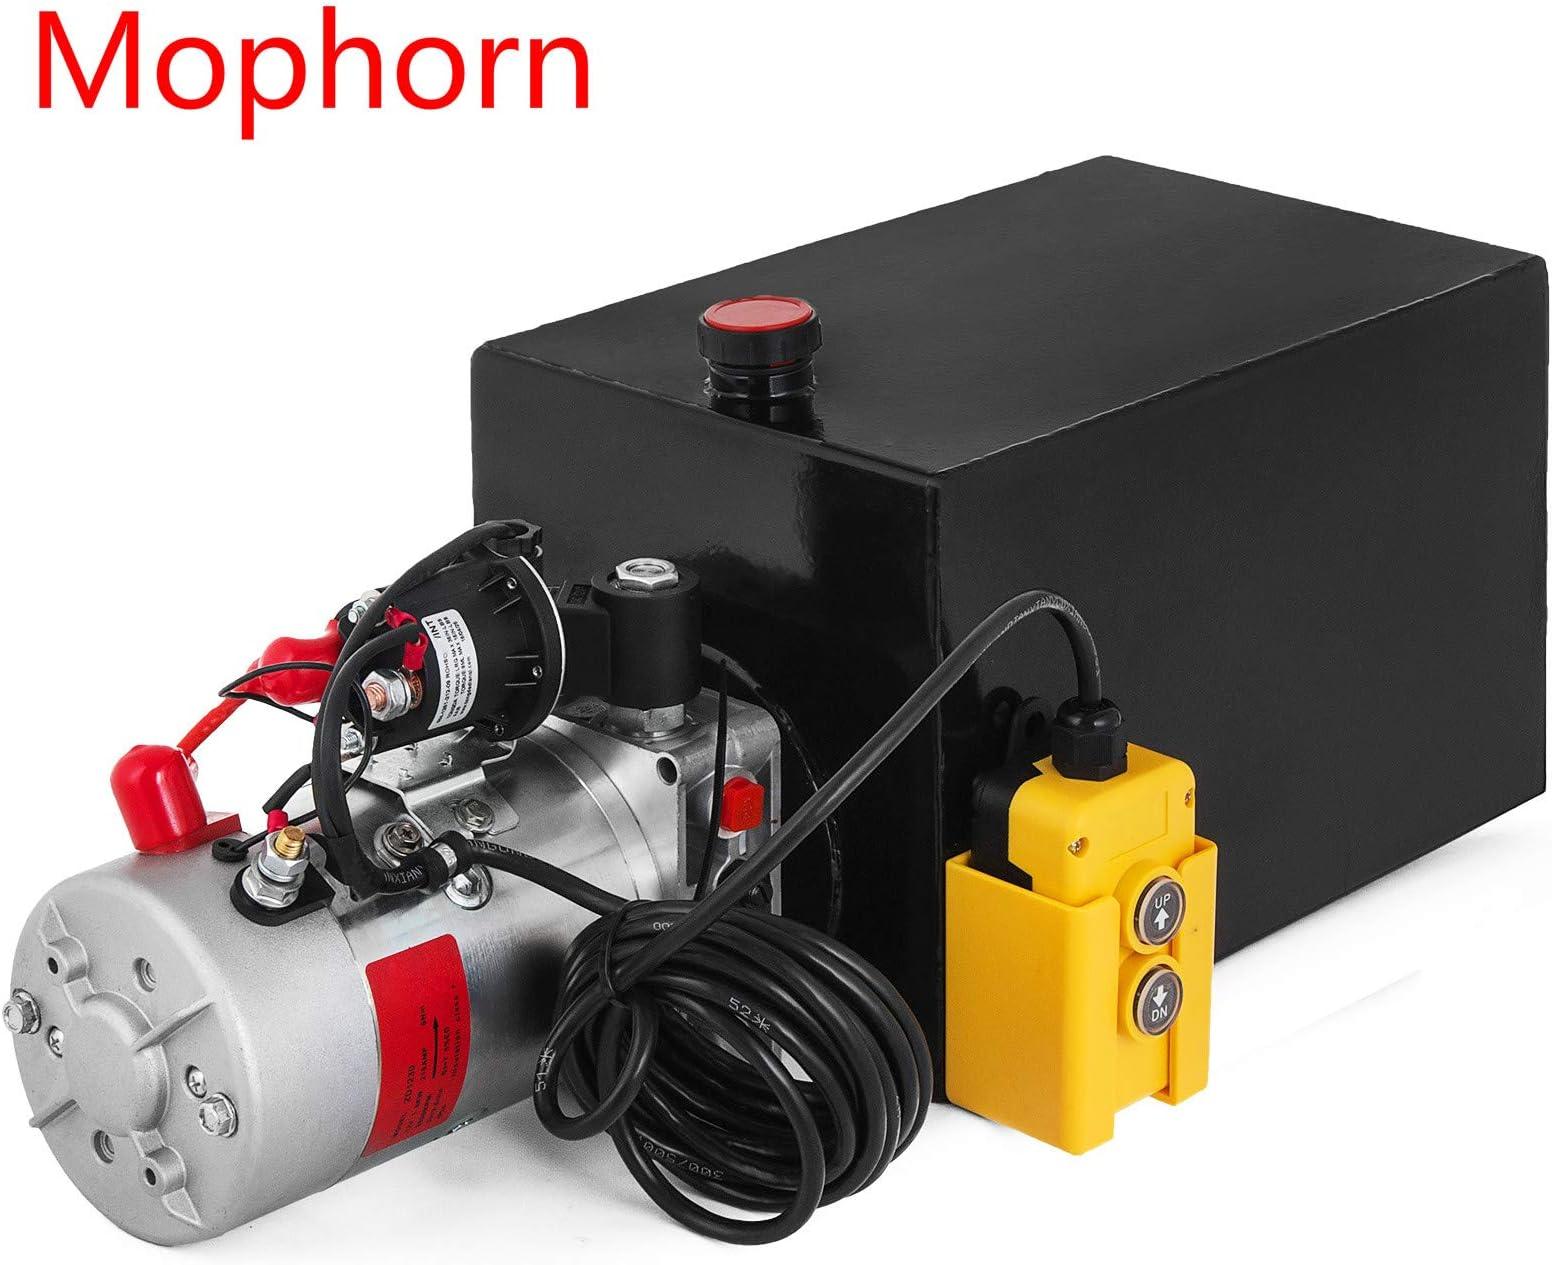 12v Hydraulic Pump Wiring Diagram On Electric Bicycle Wiring Diagrams